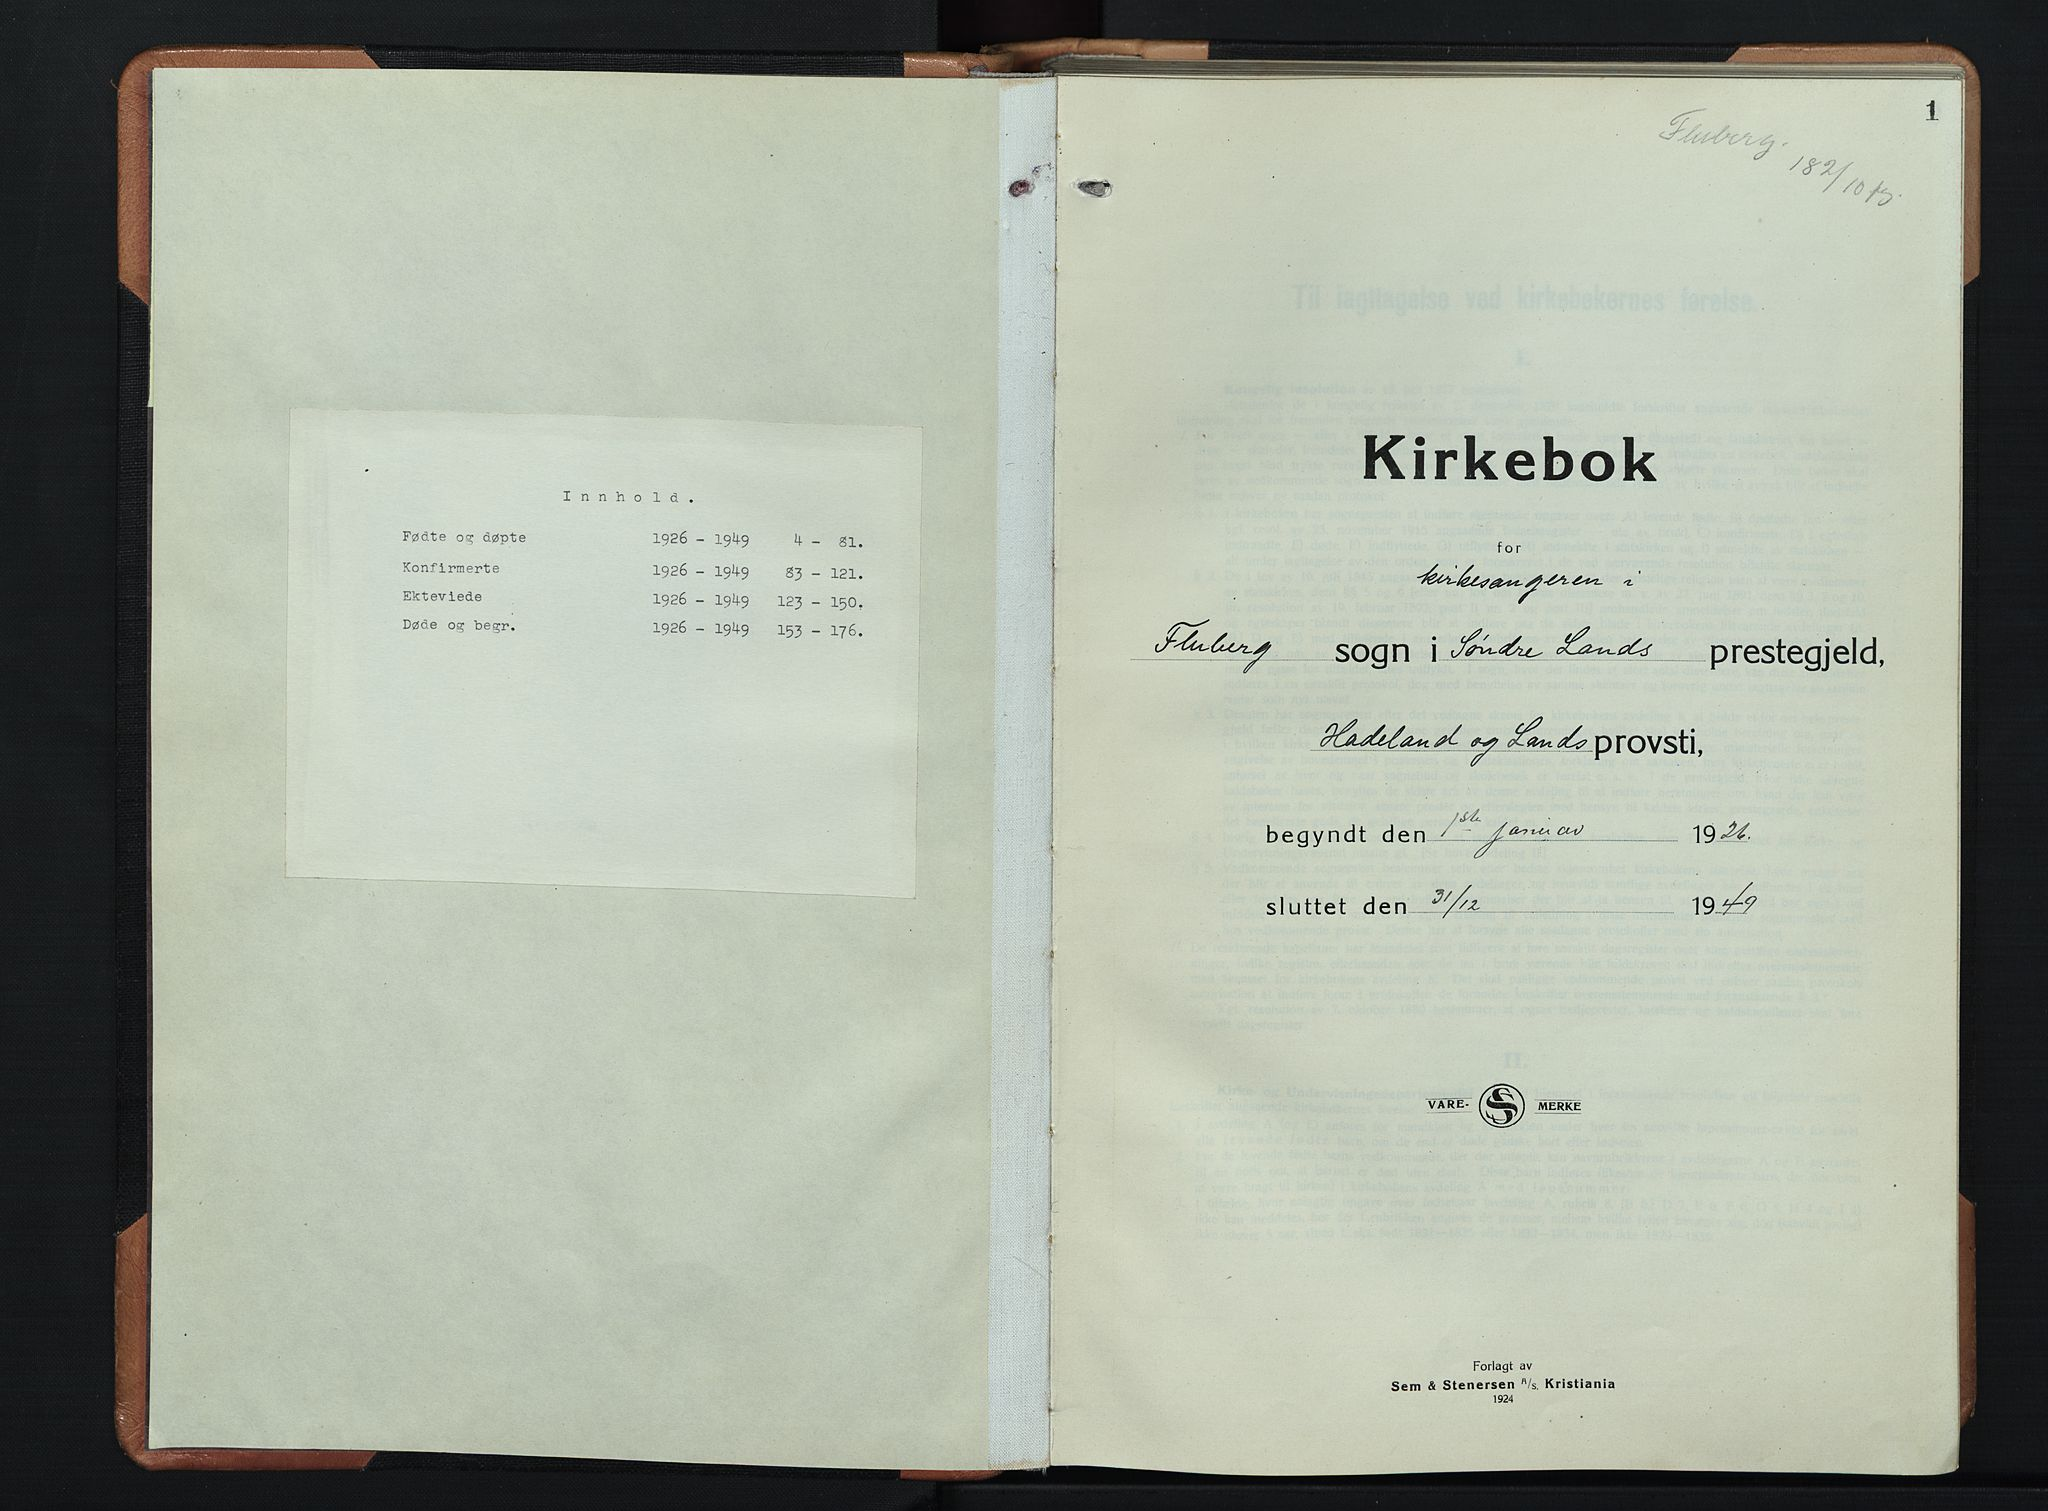 SAH, Søndre Land prestekontor, L/L0008: Klokkerbok nr. 8, 1926-1950, s. 1